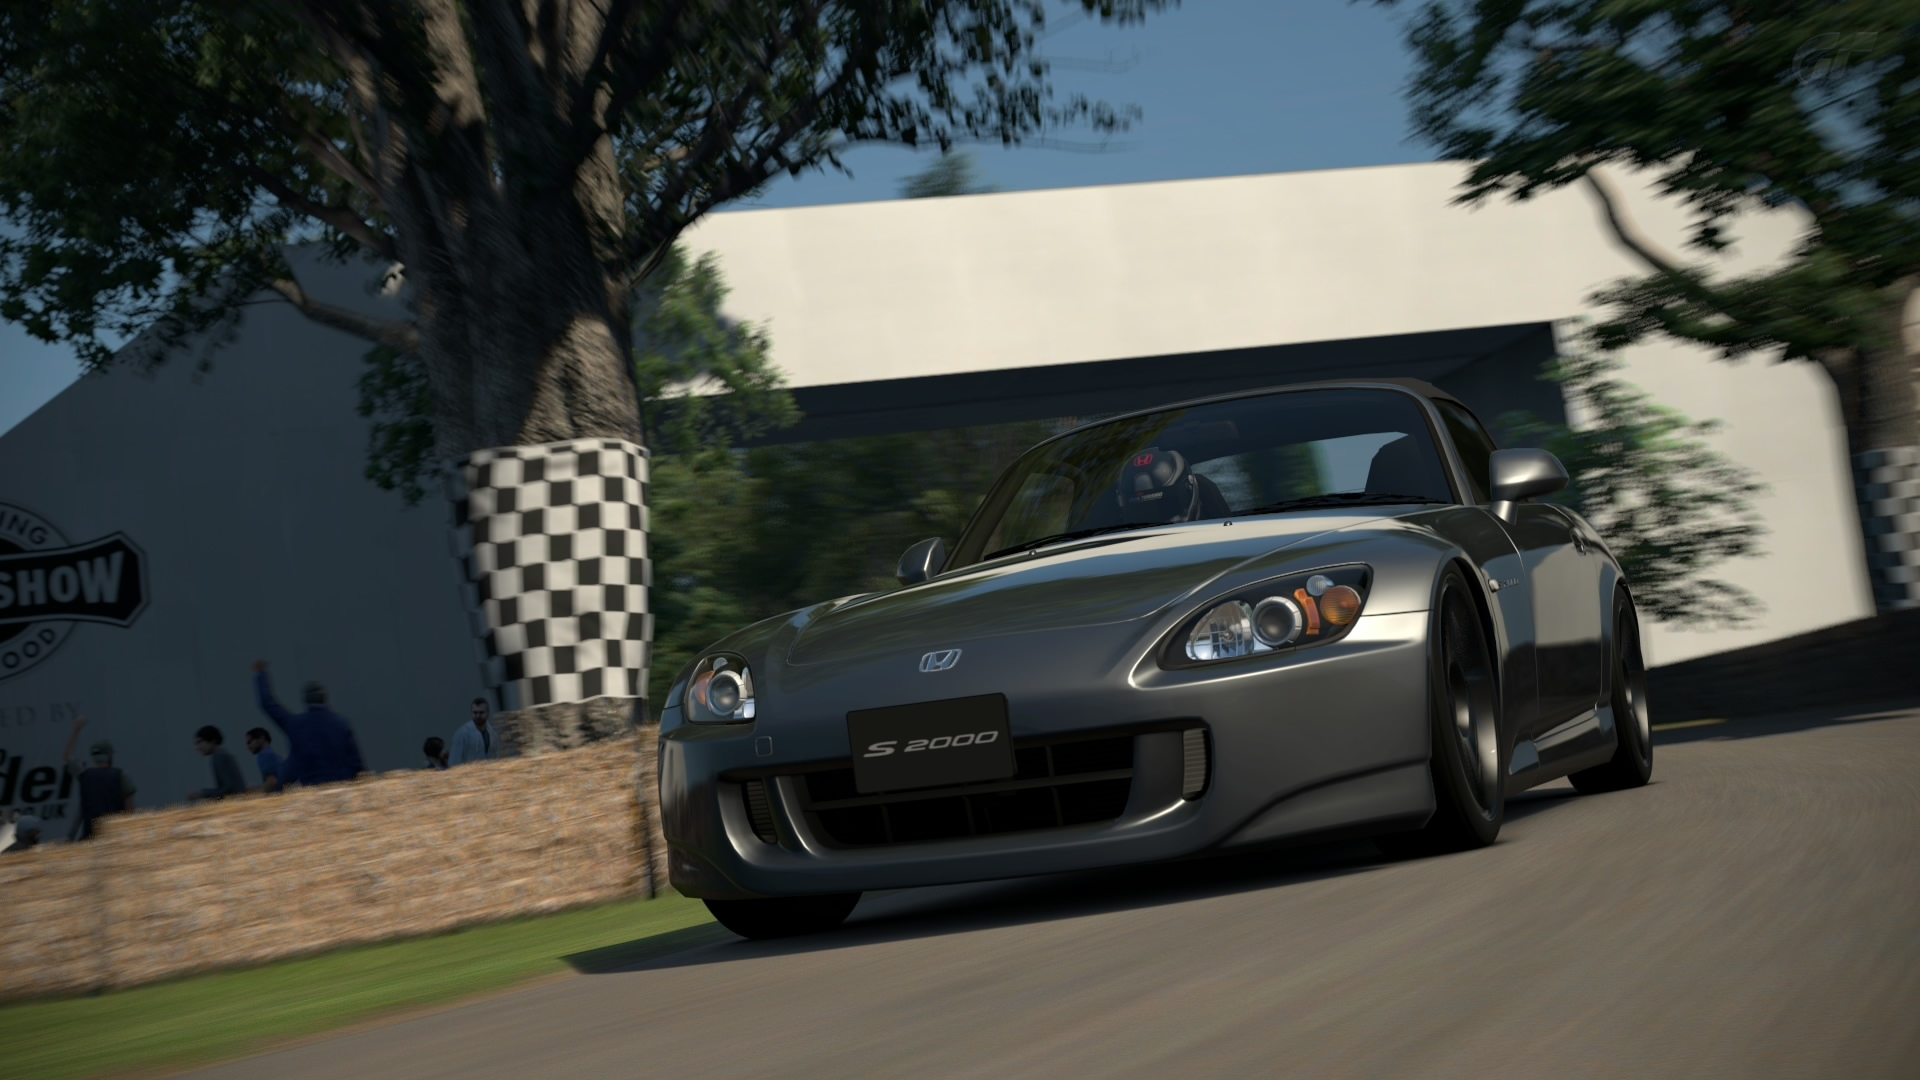 Honda Kansas City >> Got Gran Turismo 6? Post your S2000 photos! - S2KI Honda S2000 Forums